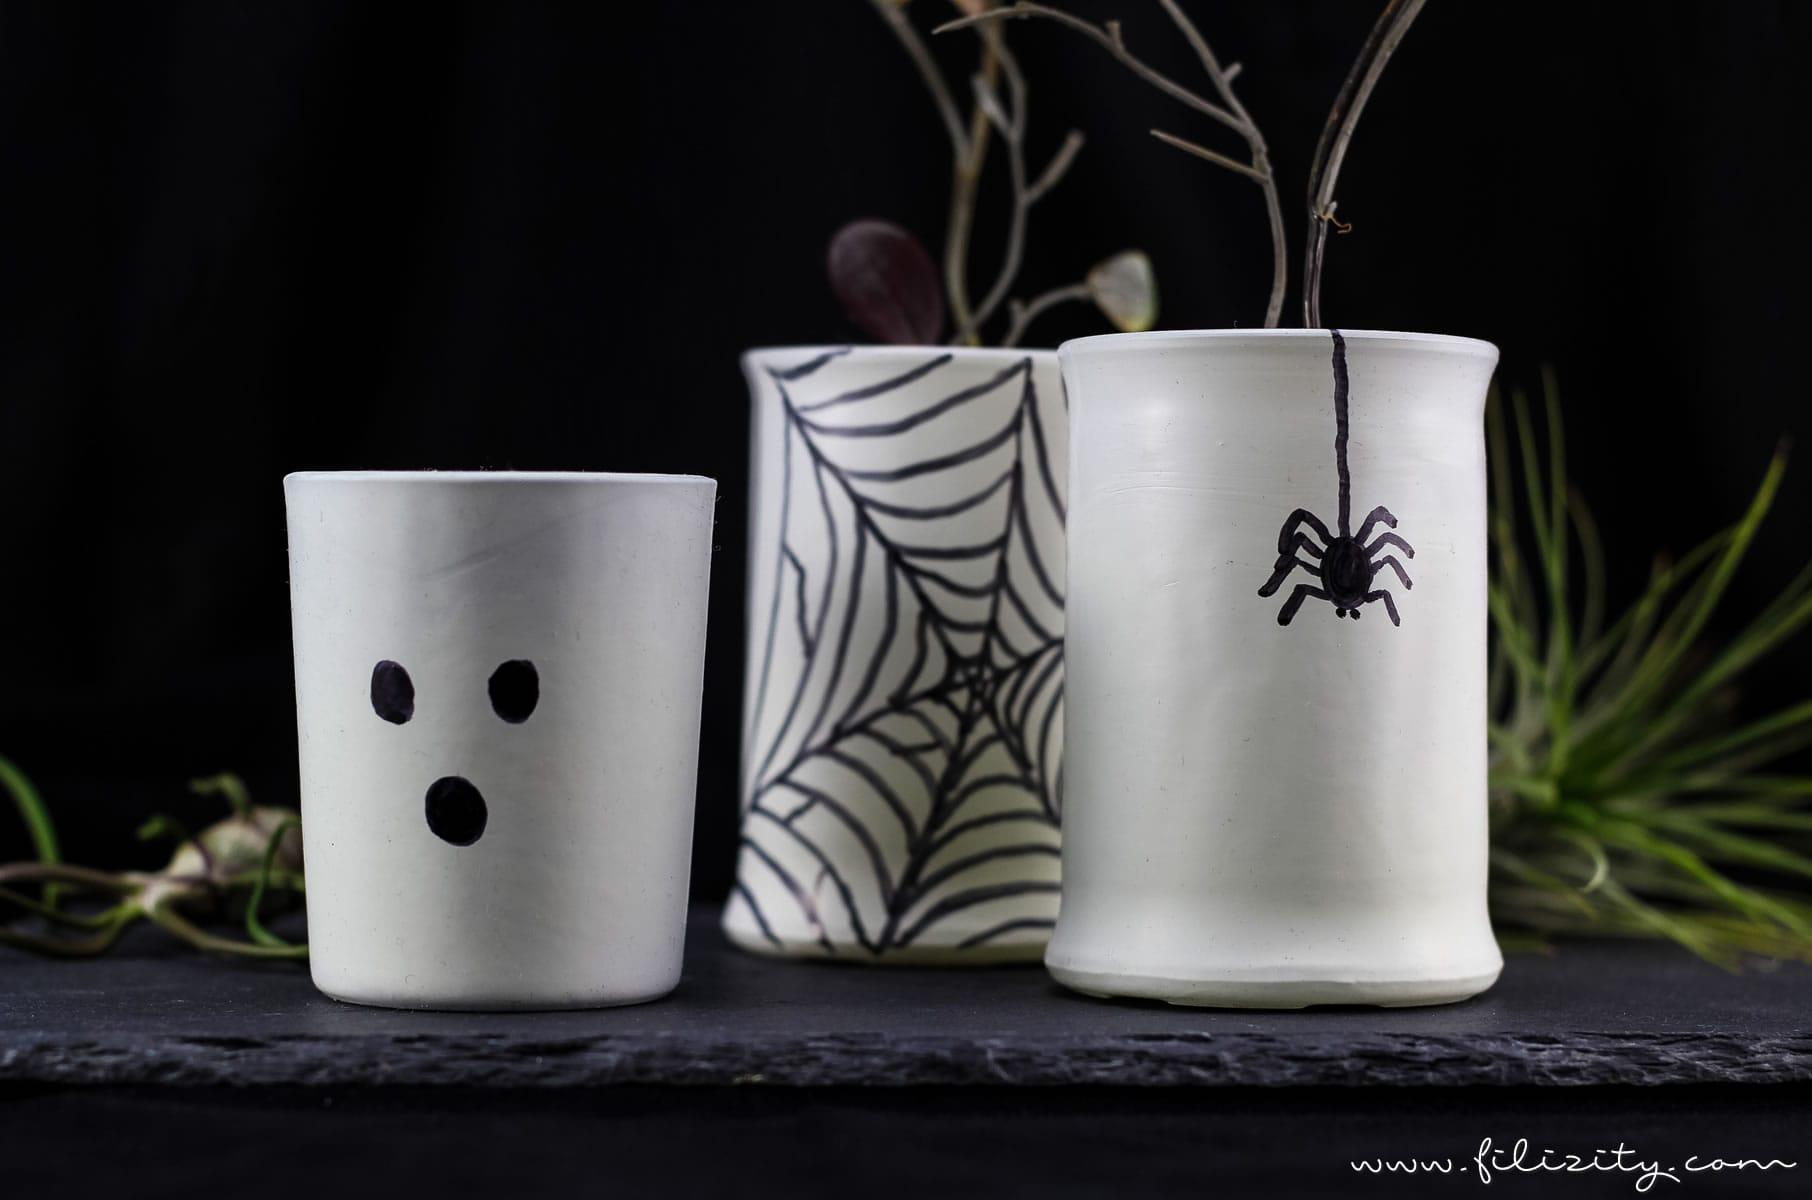 Einfache Halloween Deko Idee: Glow in the dark Vasen selber machen | Filizity.com | DIY-Blog aus dem Rheinland #halloween #deko